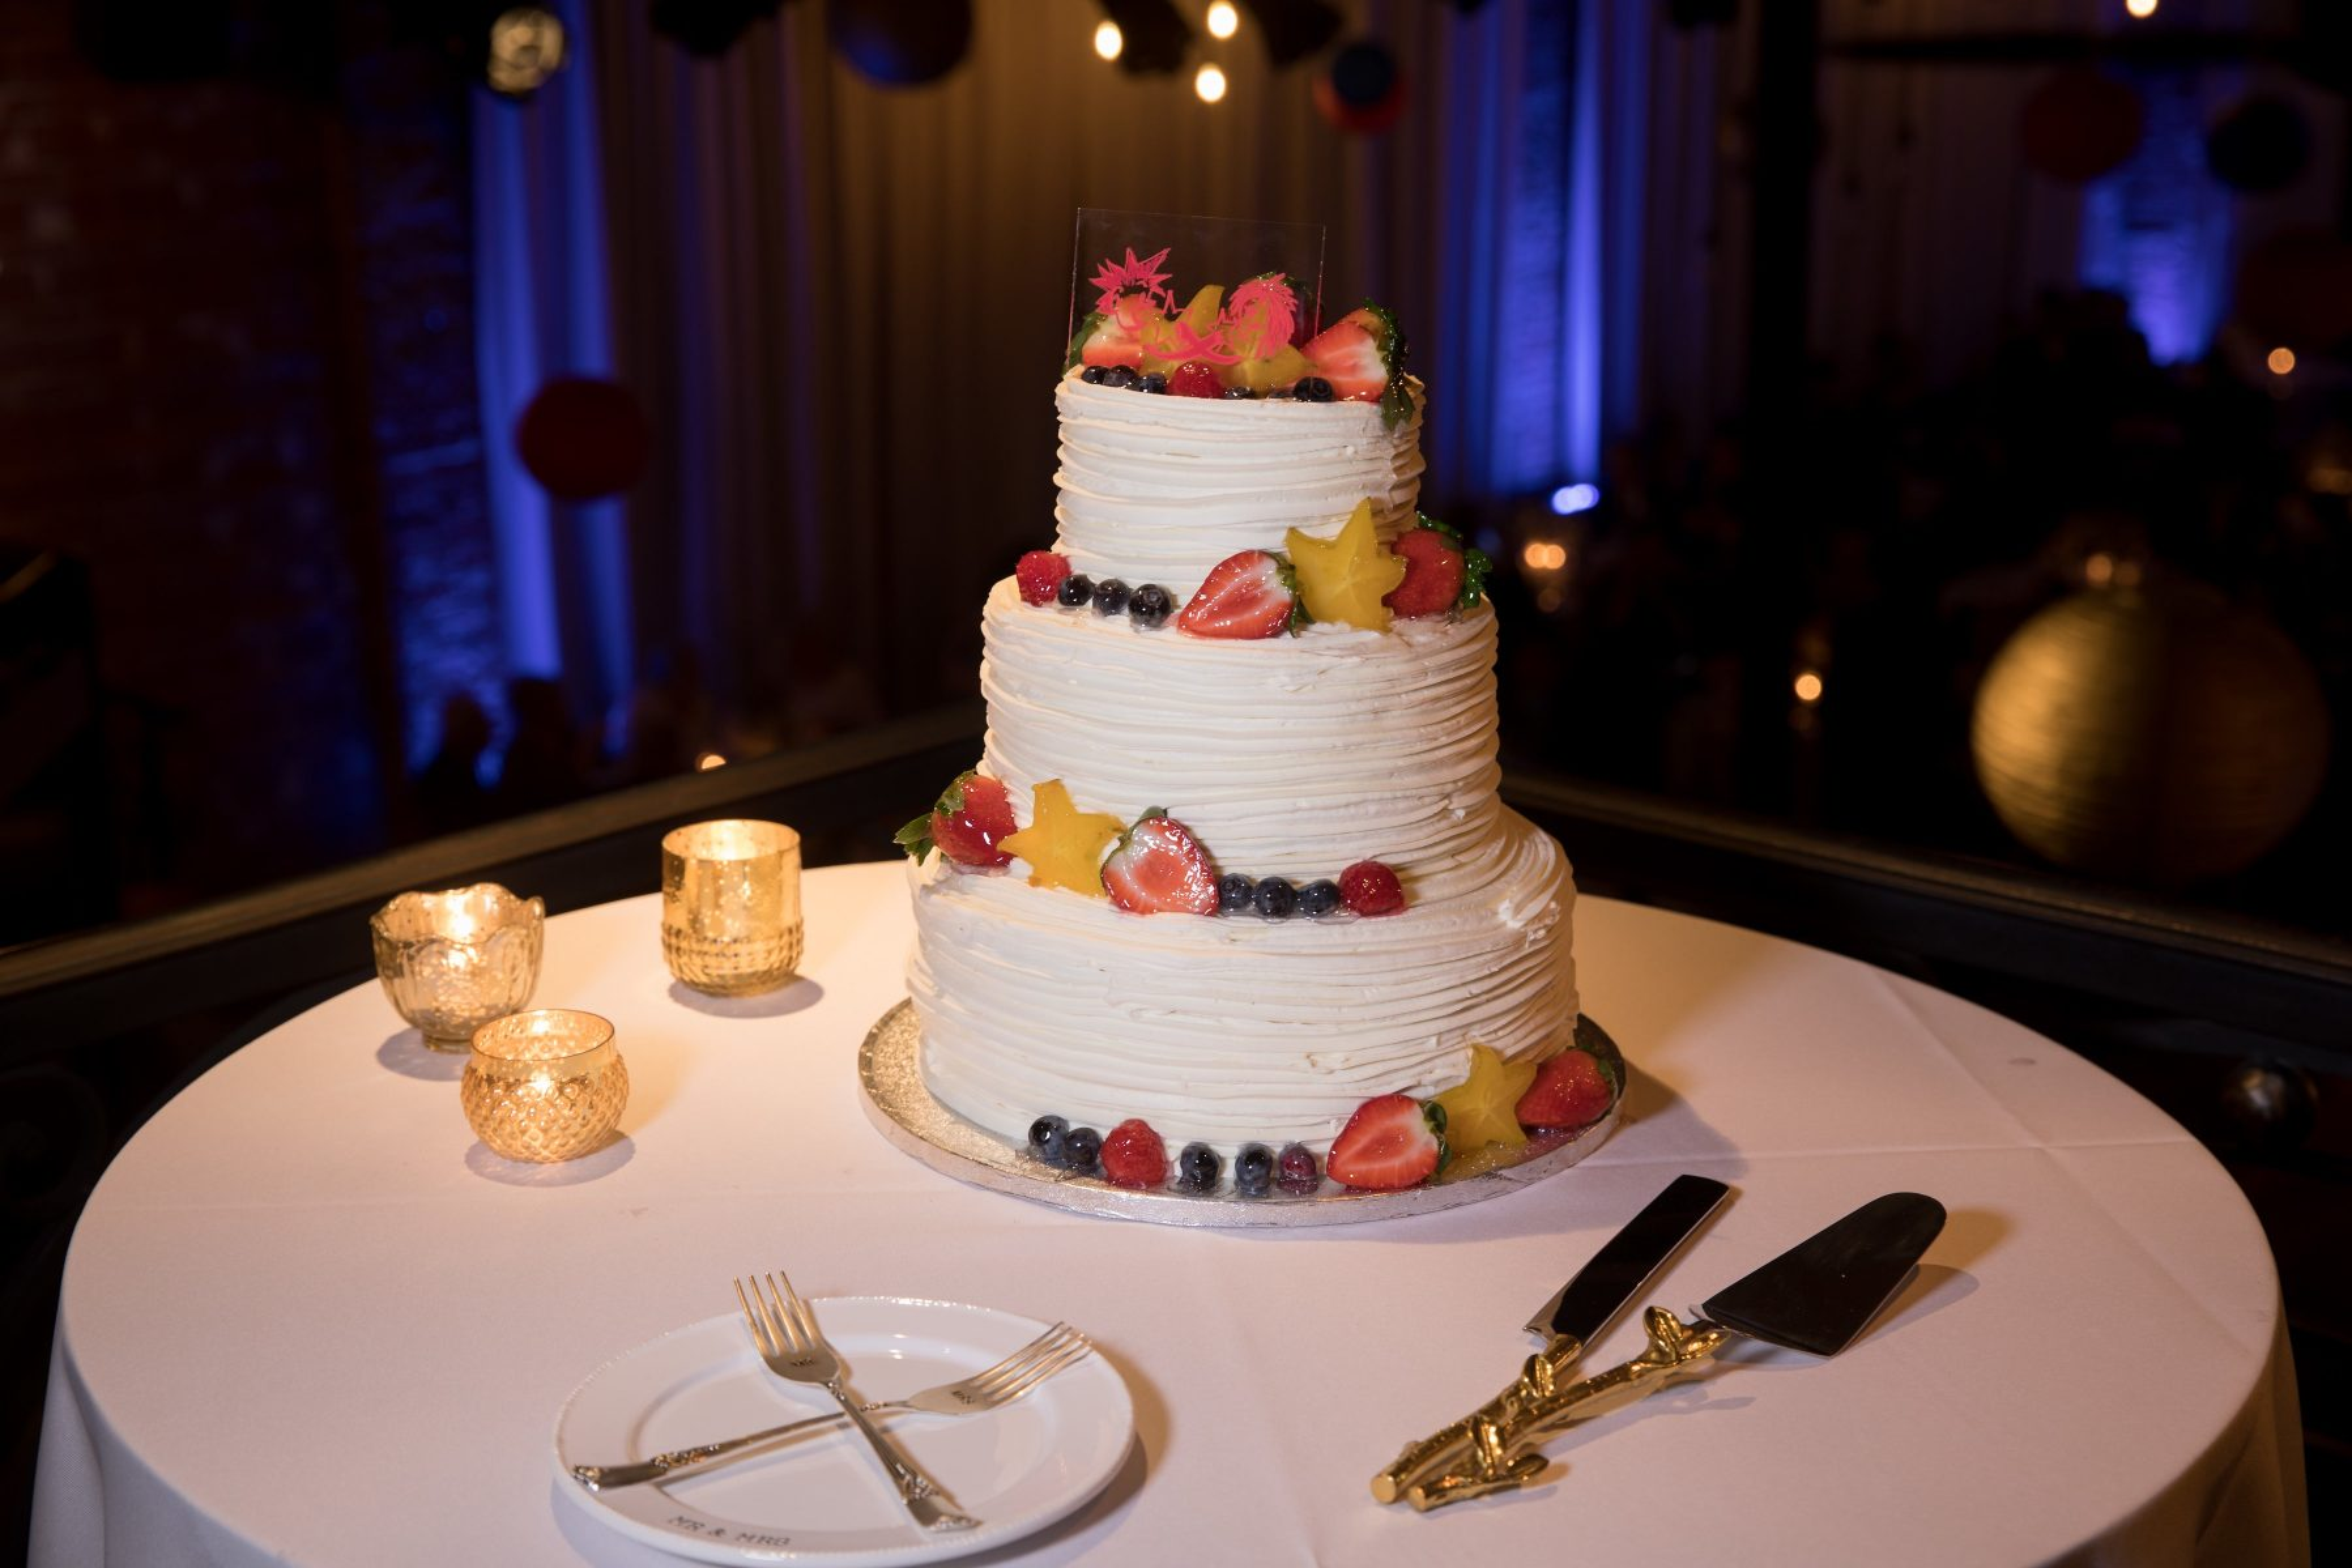 Buttercream wedding cake with fresh fruit